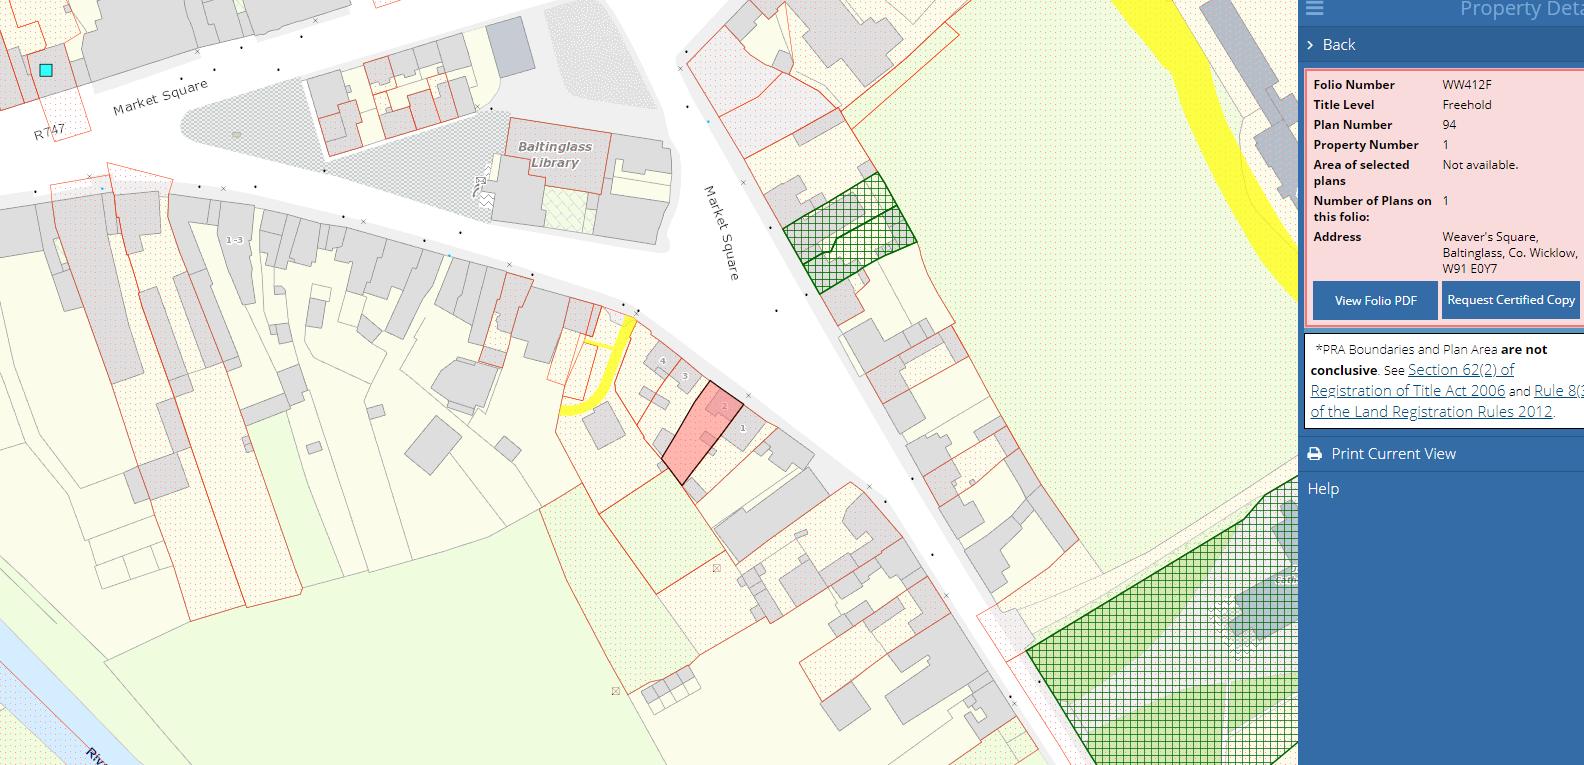 Weaver's Square, Baltinglass, Co. Wicklow